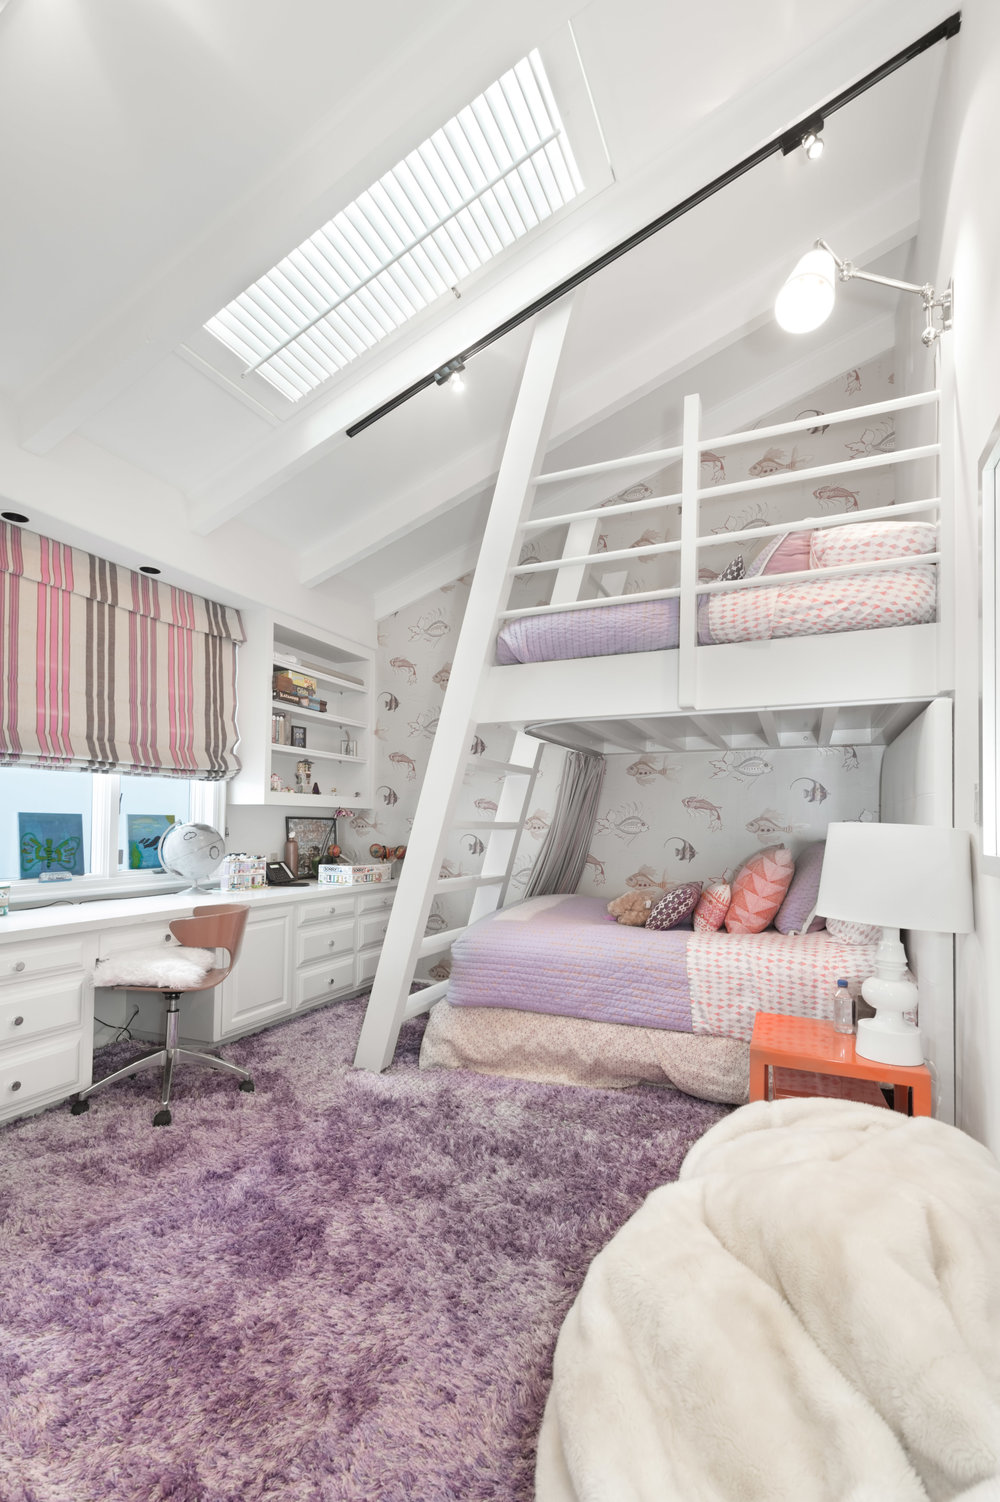 026 Bedroom 23930 Malibu Road For Sale Lease The Malibu Life Team Luxury Real Estate.jpg